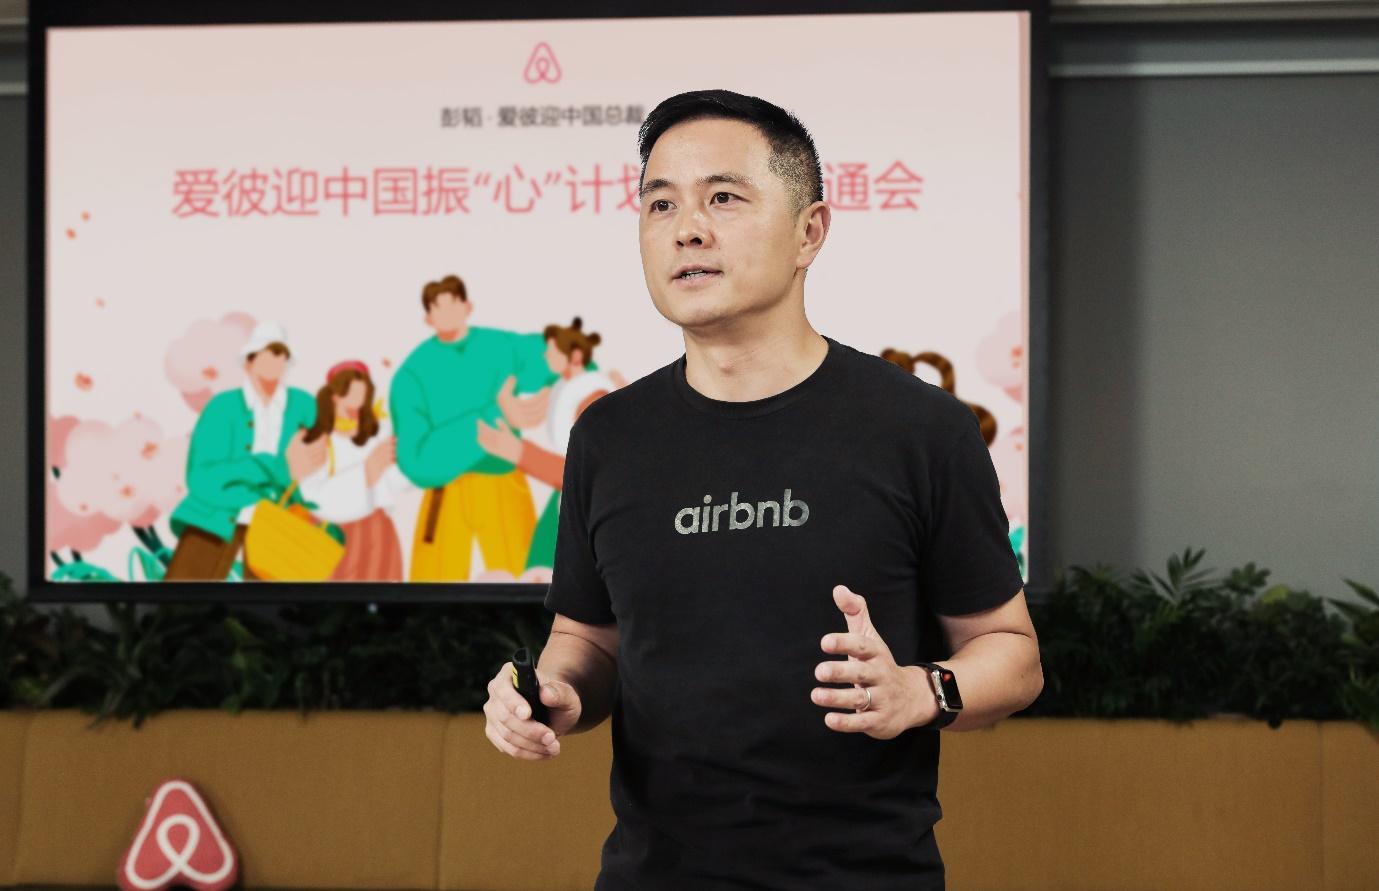 "Airbnb爱彼迎社区振""心""计划 助力共享住宿业疫后复兴"